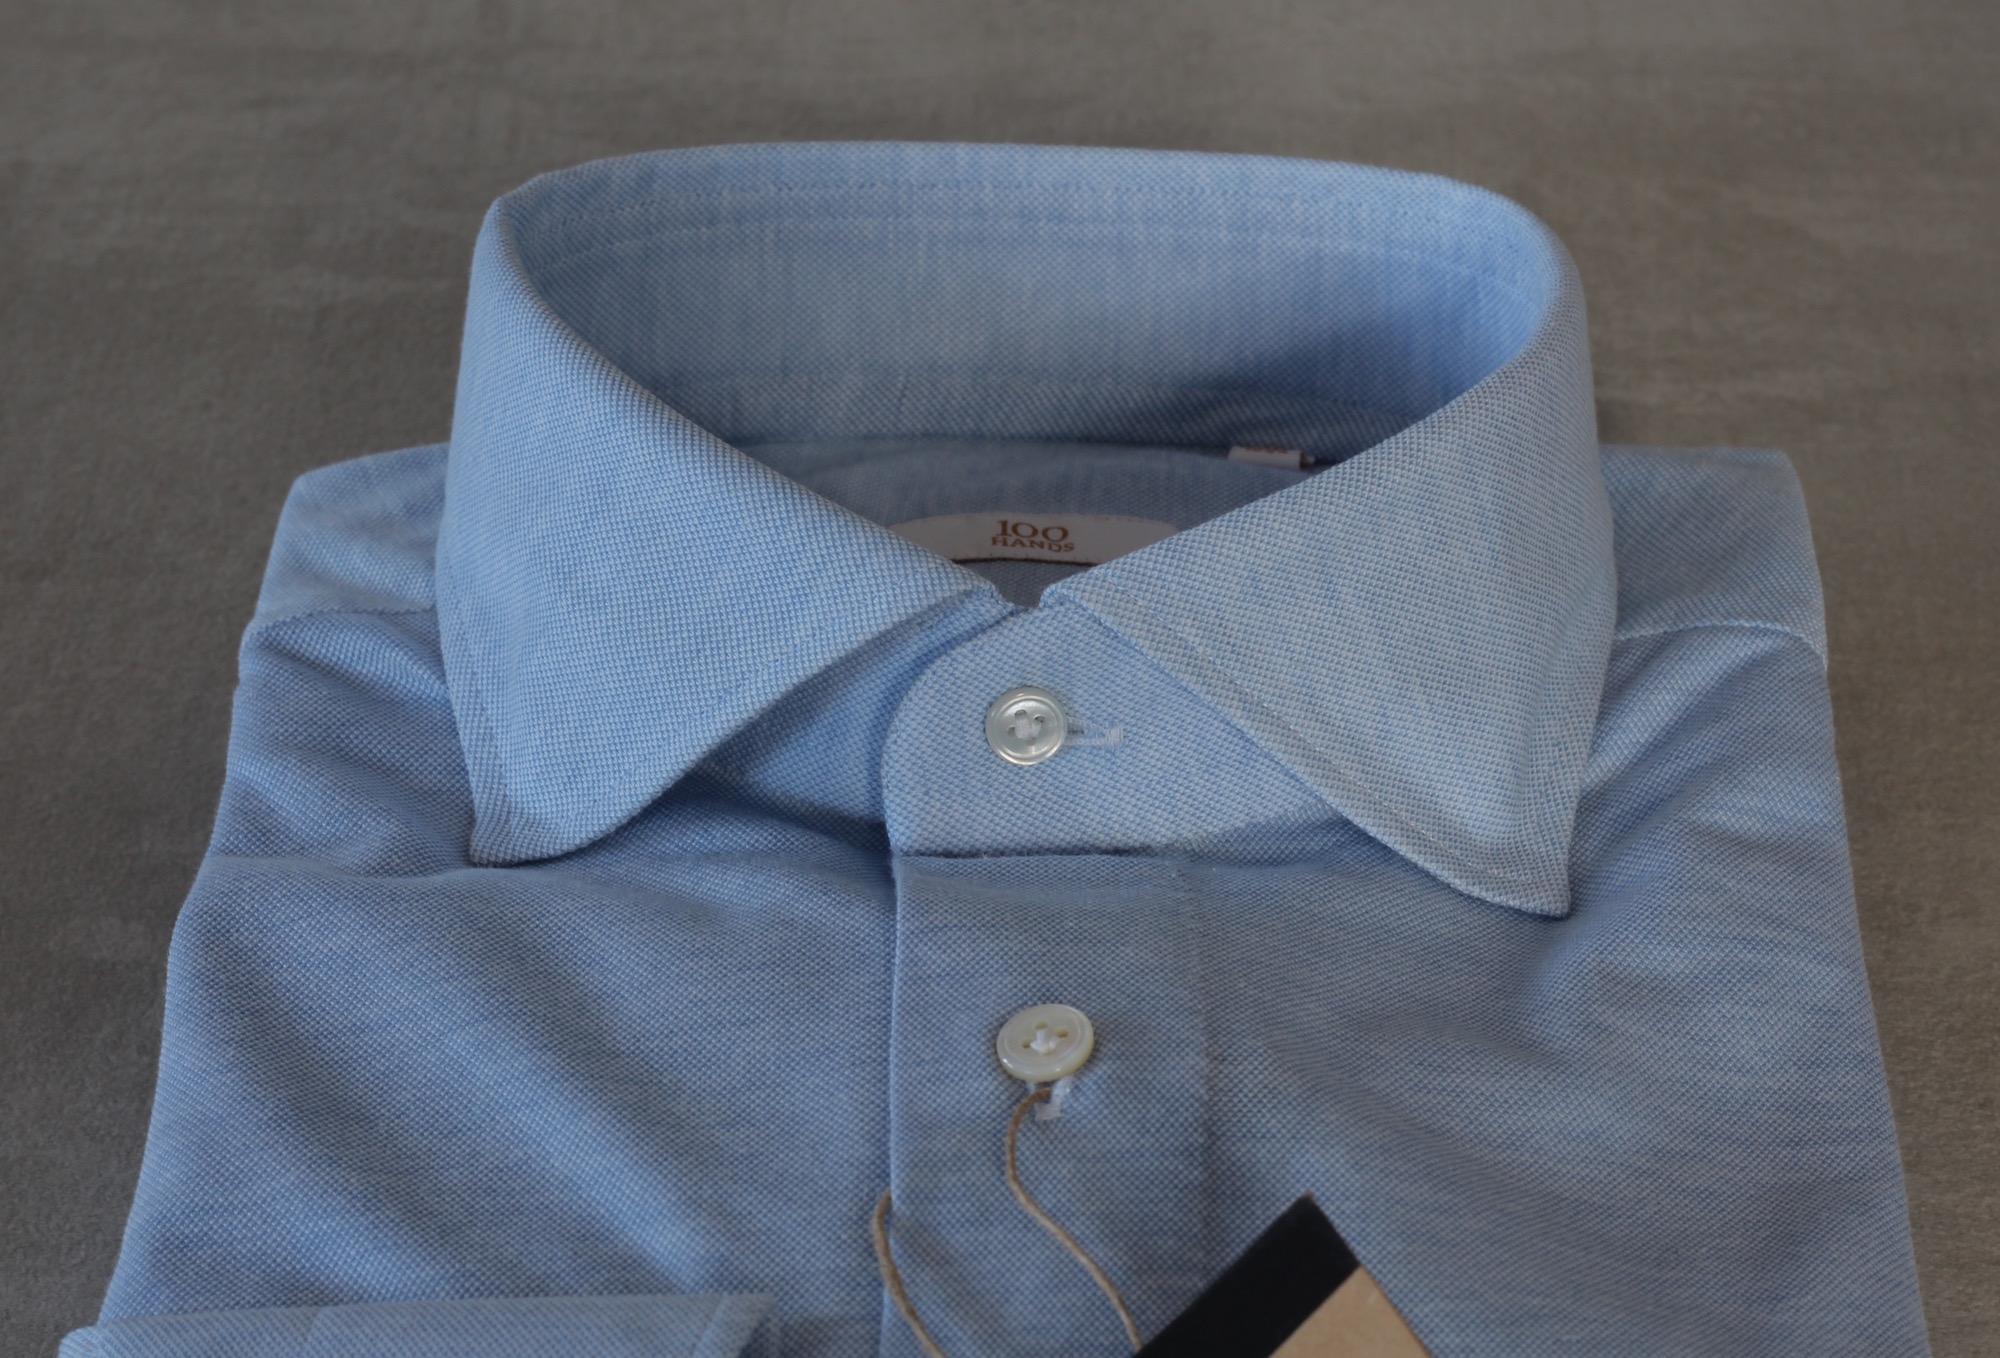 100HANDS handgefertigtes Jersey Langarm-Polohemd | SEESTRASSE7